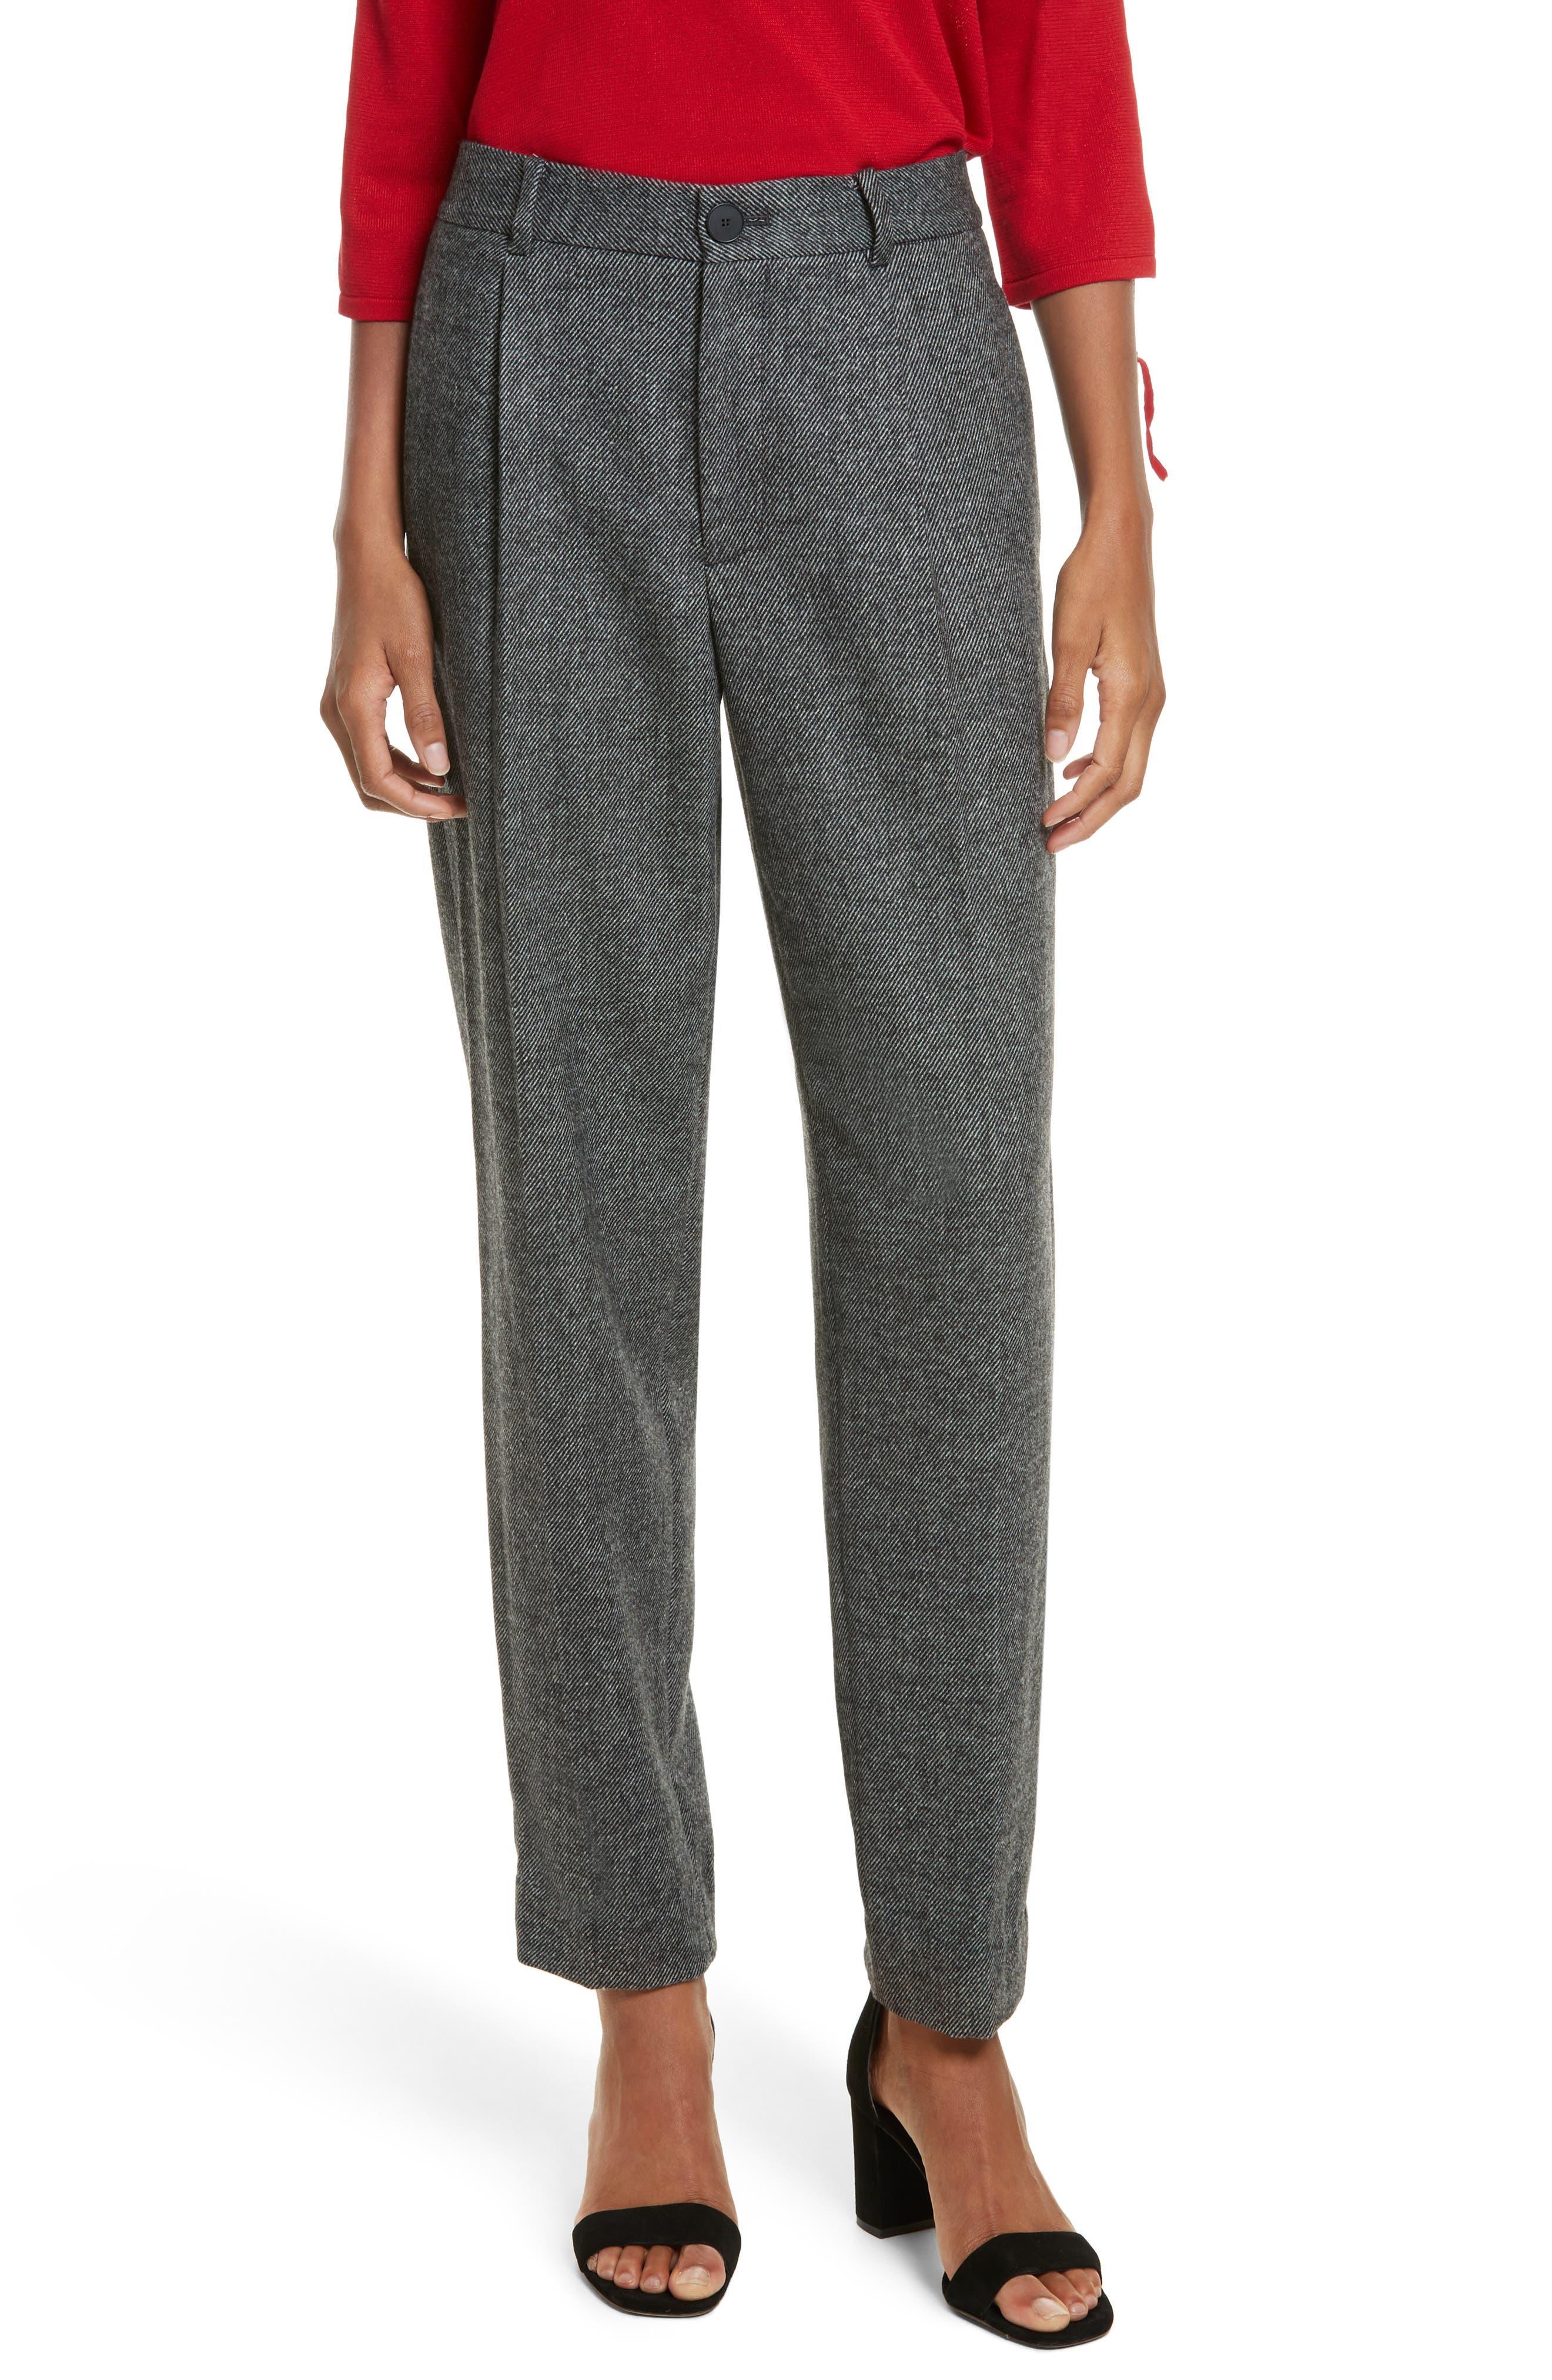 GREY Jason Wu Pleated Flannel Pants